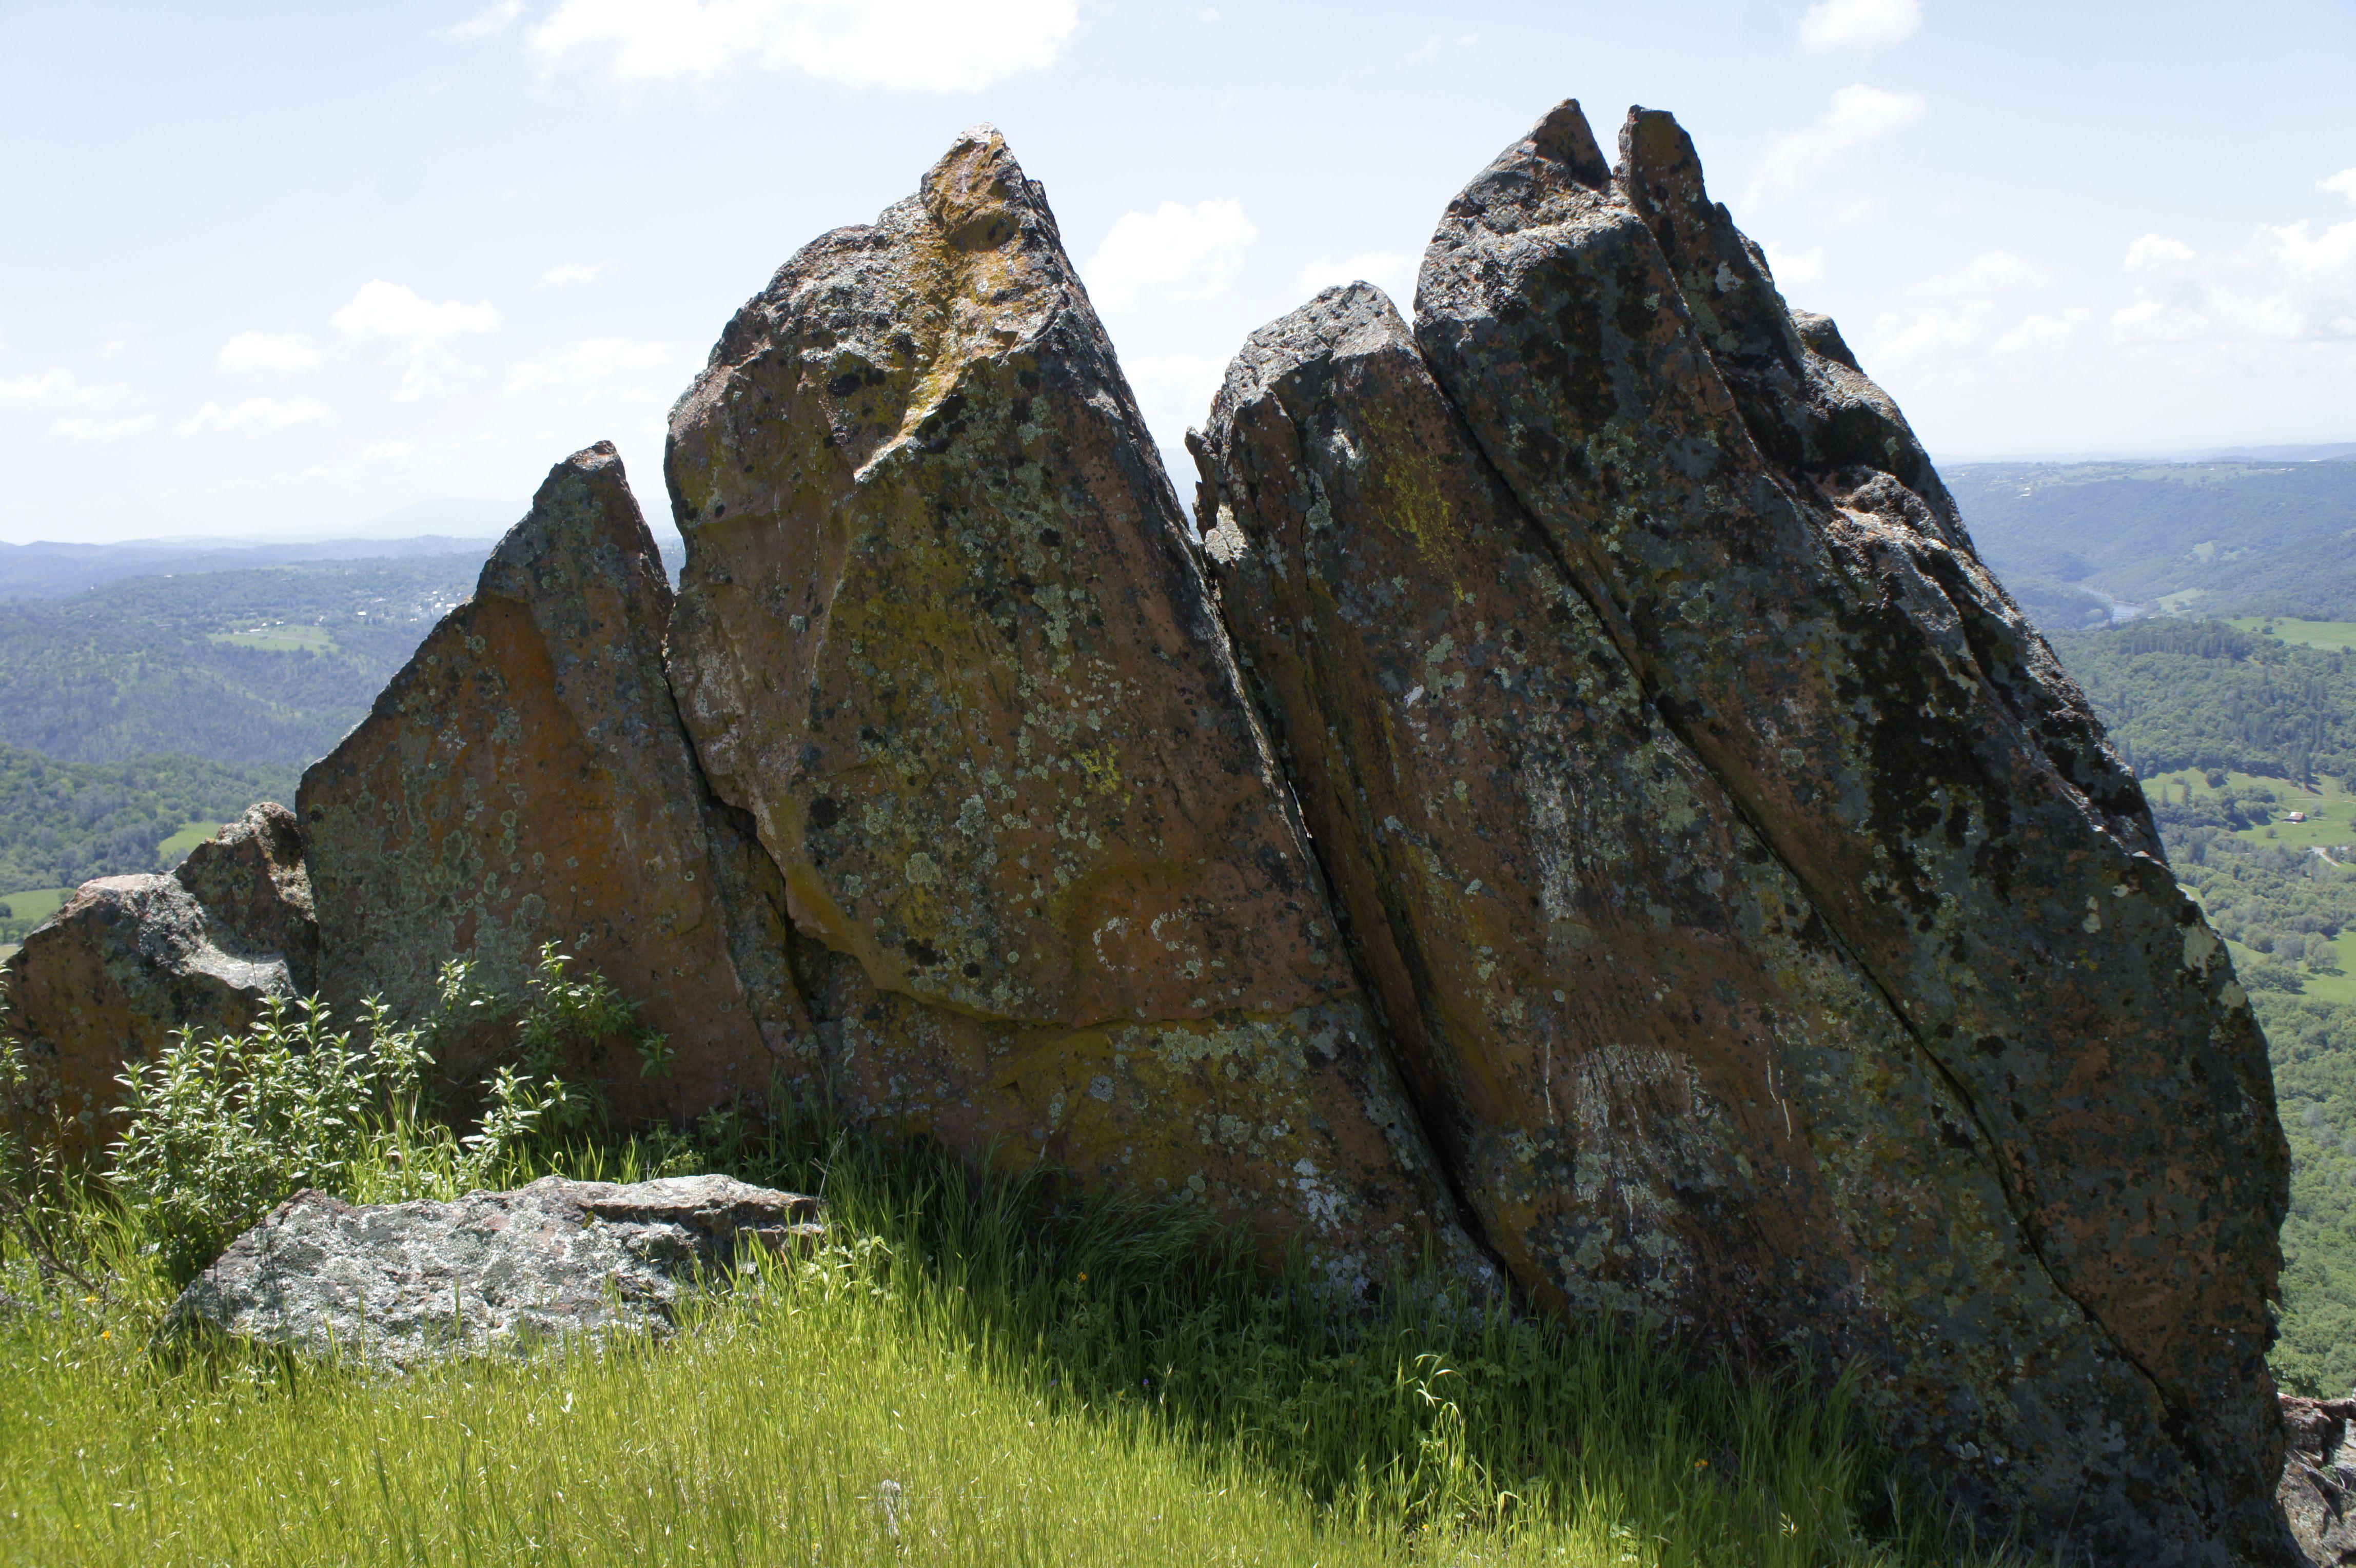 Amador california jackson butte mtn ancient photo number